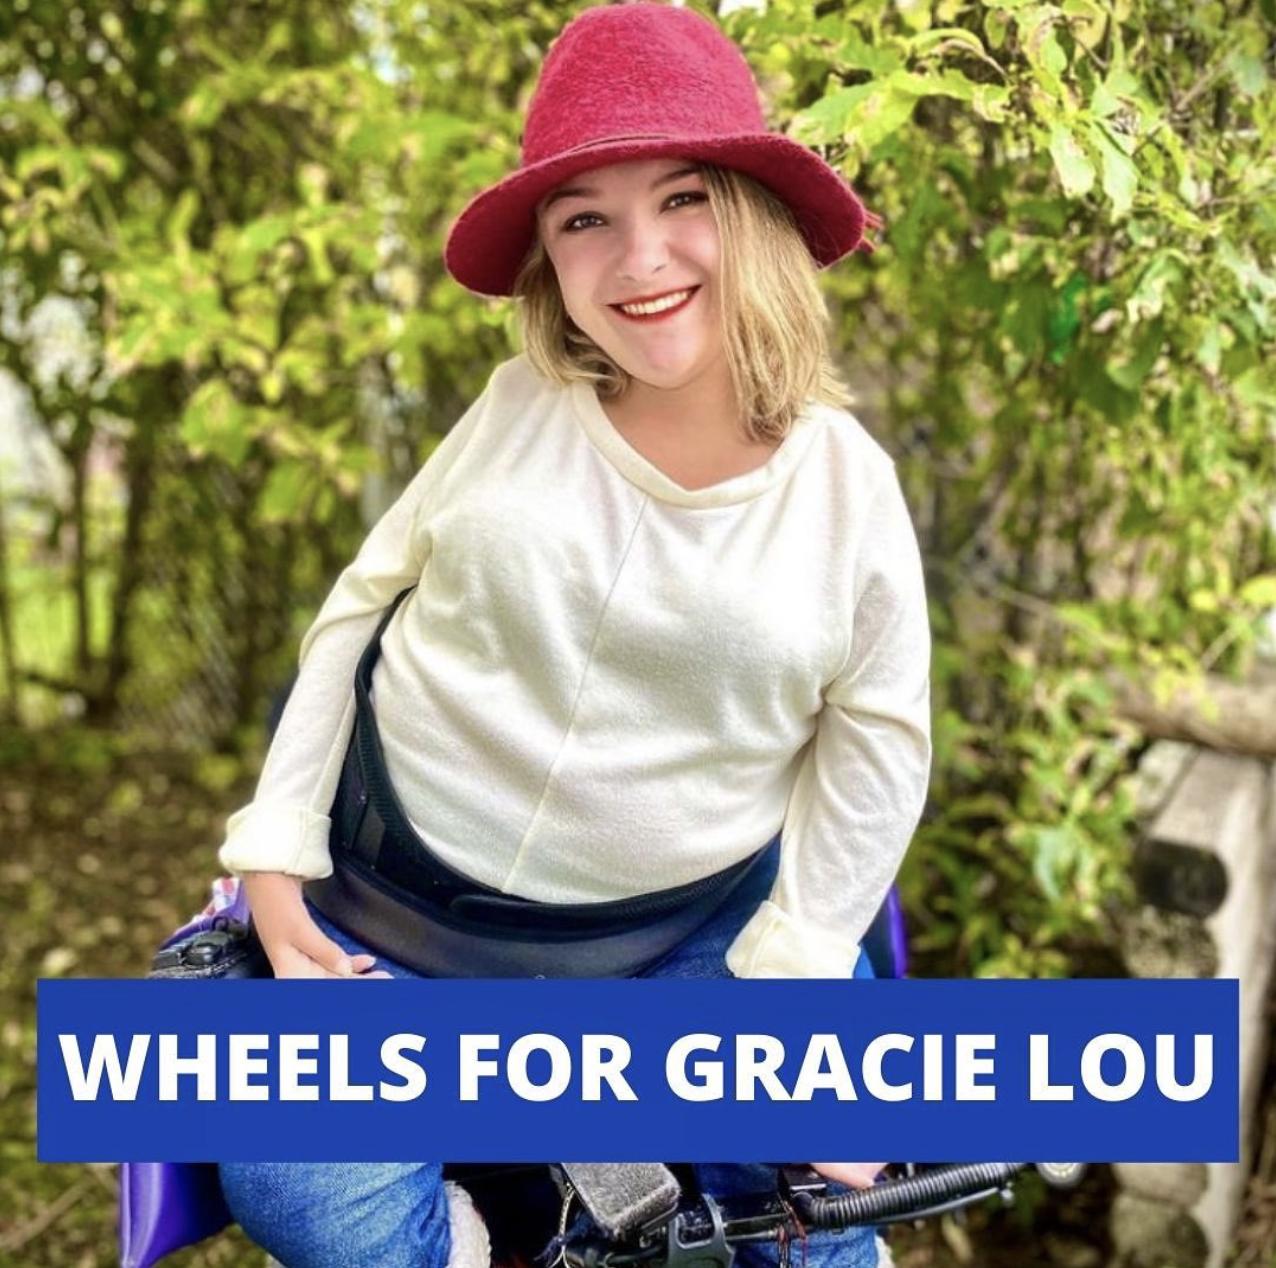 Wheels for Gracie Lou Silent Auction